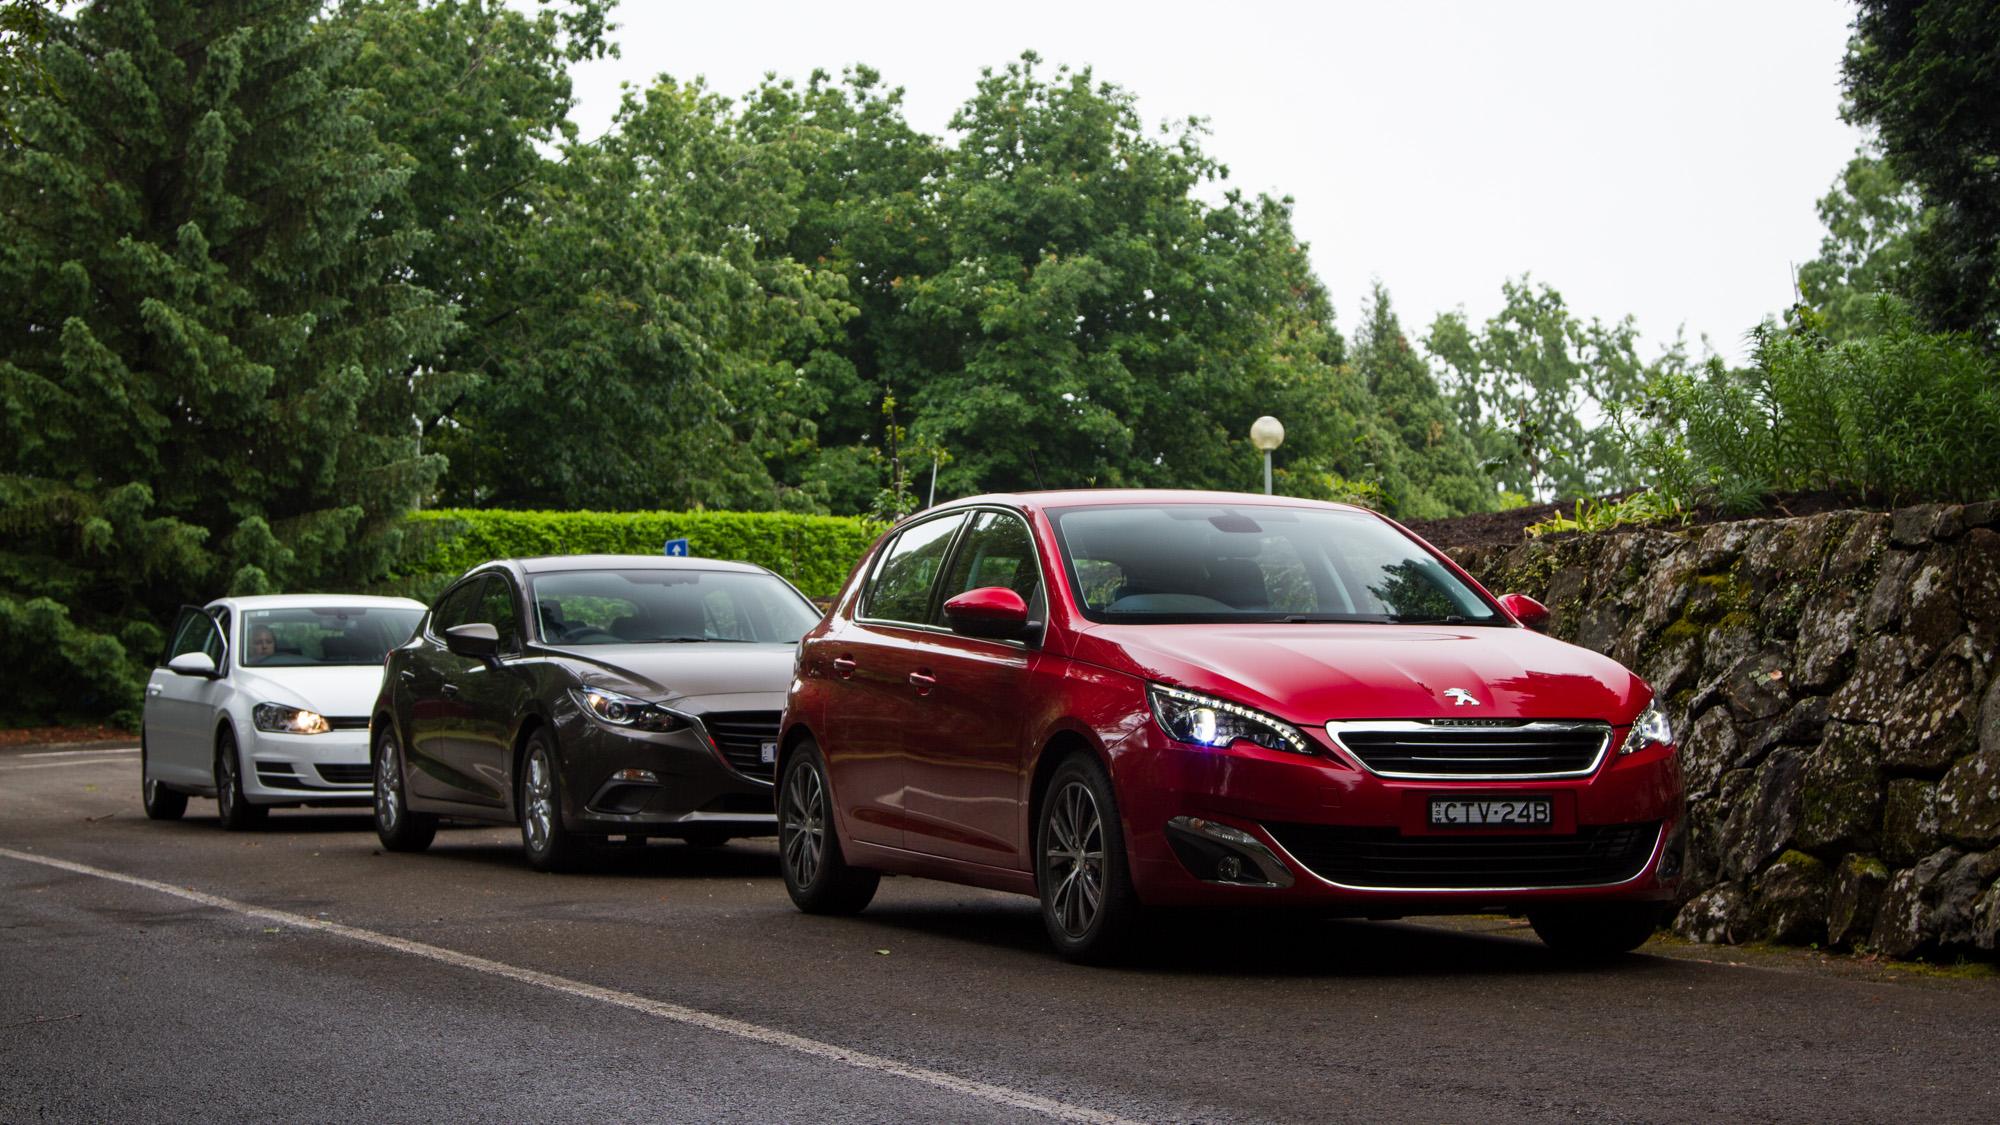 Small car comparison : Mazda 3 v Peugeot 308 v Volkswagen Golf - Photos